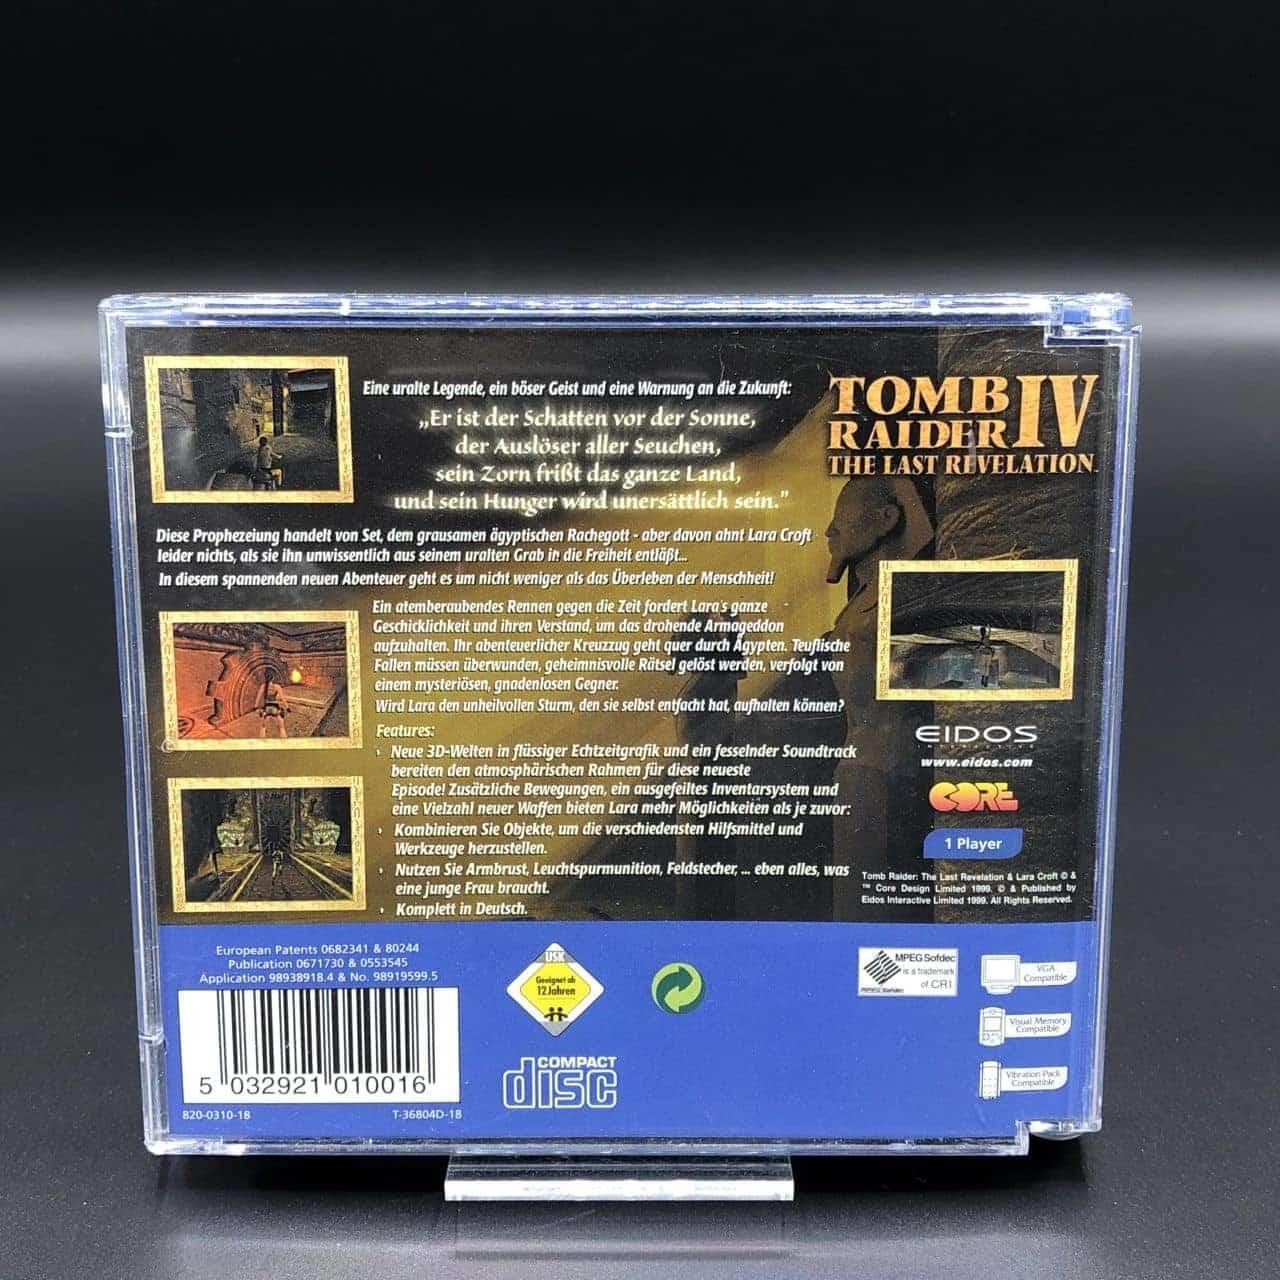 Tomb Raider IV: The Last Revelation (Komplett) (Gut) Sega Dreamcast